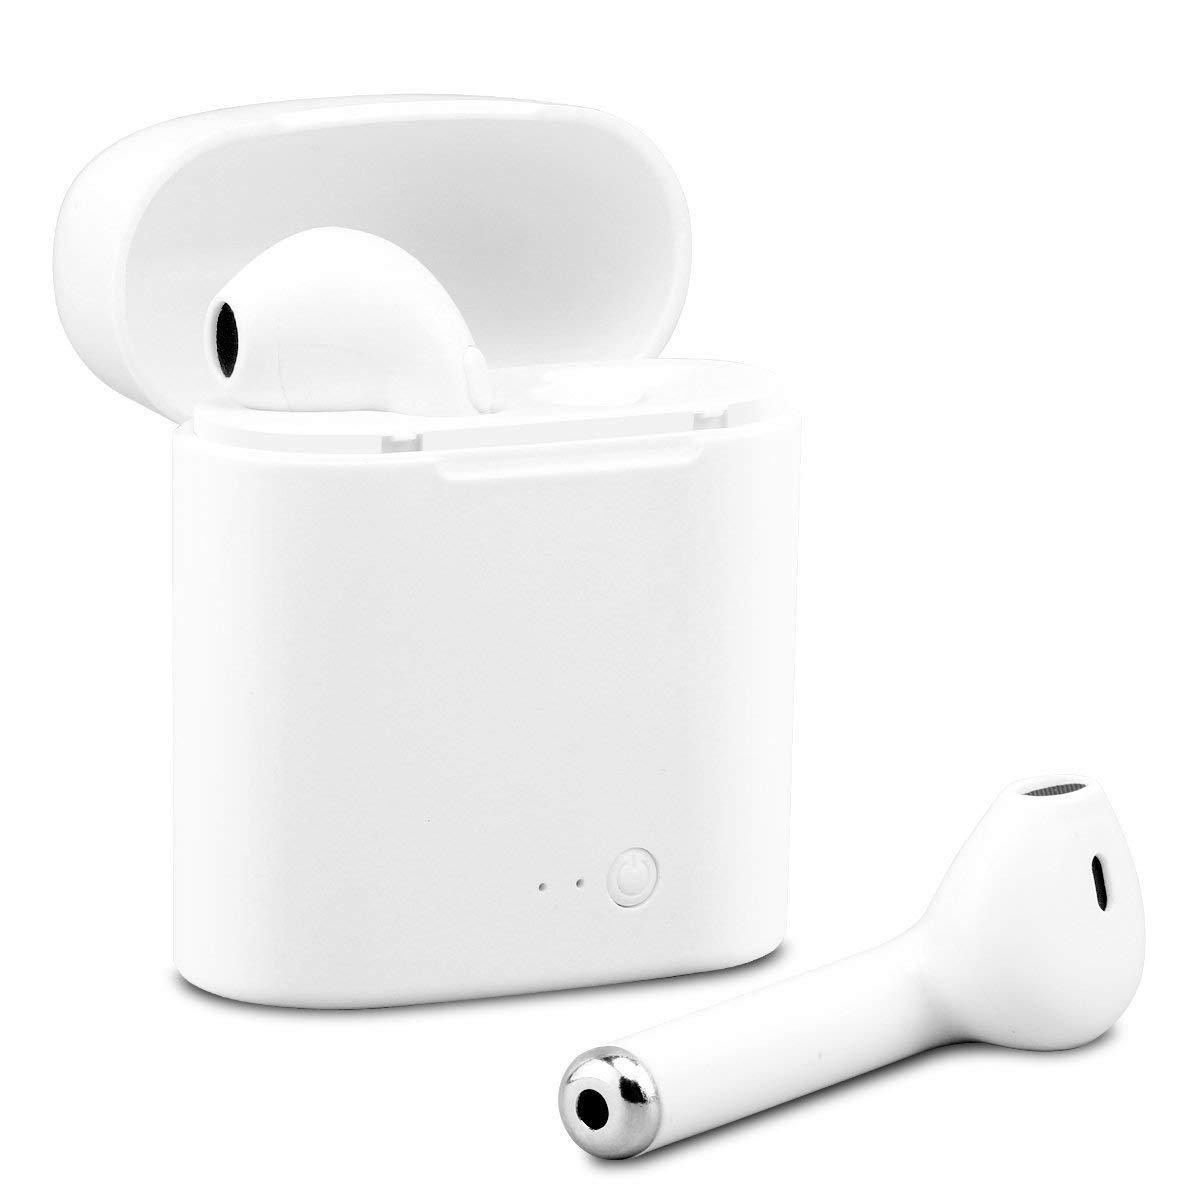 Hexdeer Wireless Headset Microphone, White Earbuds